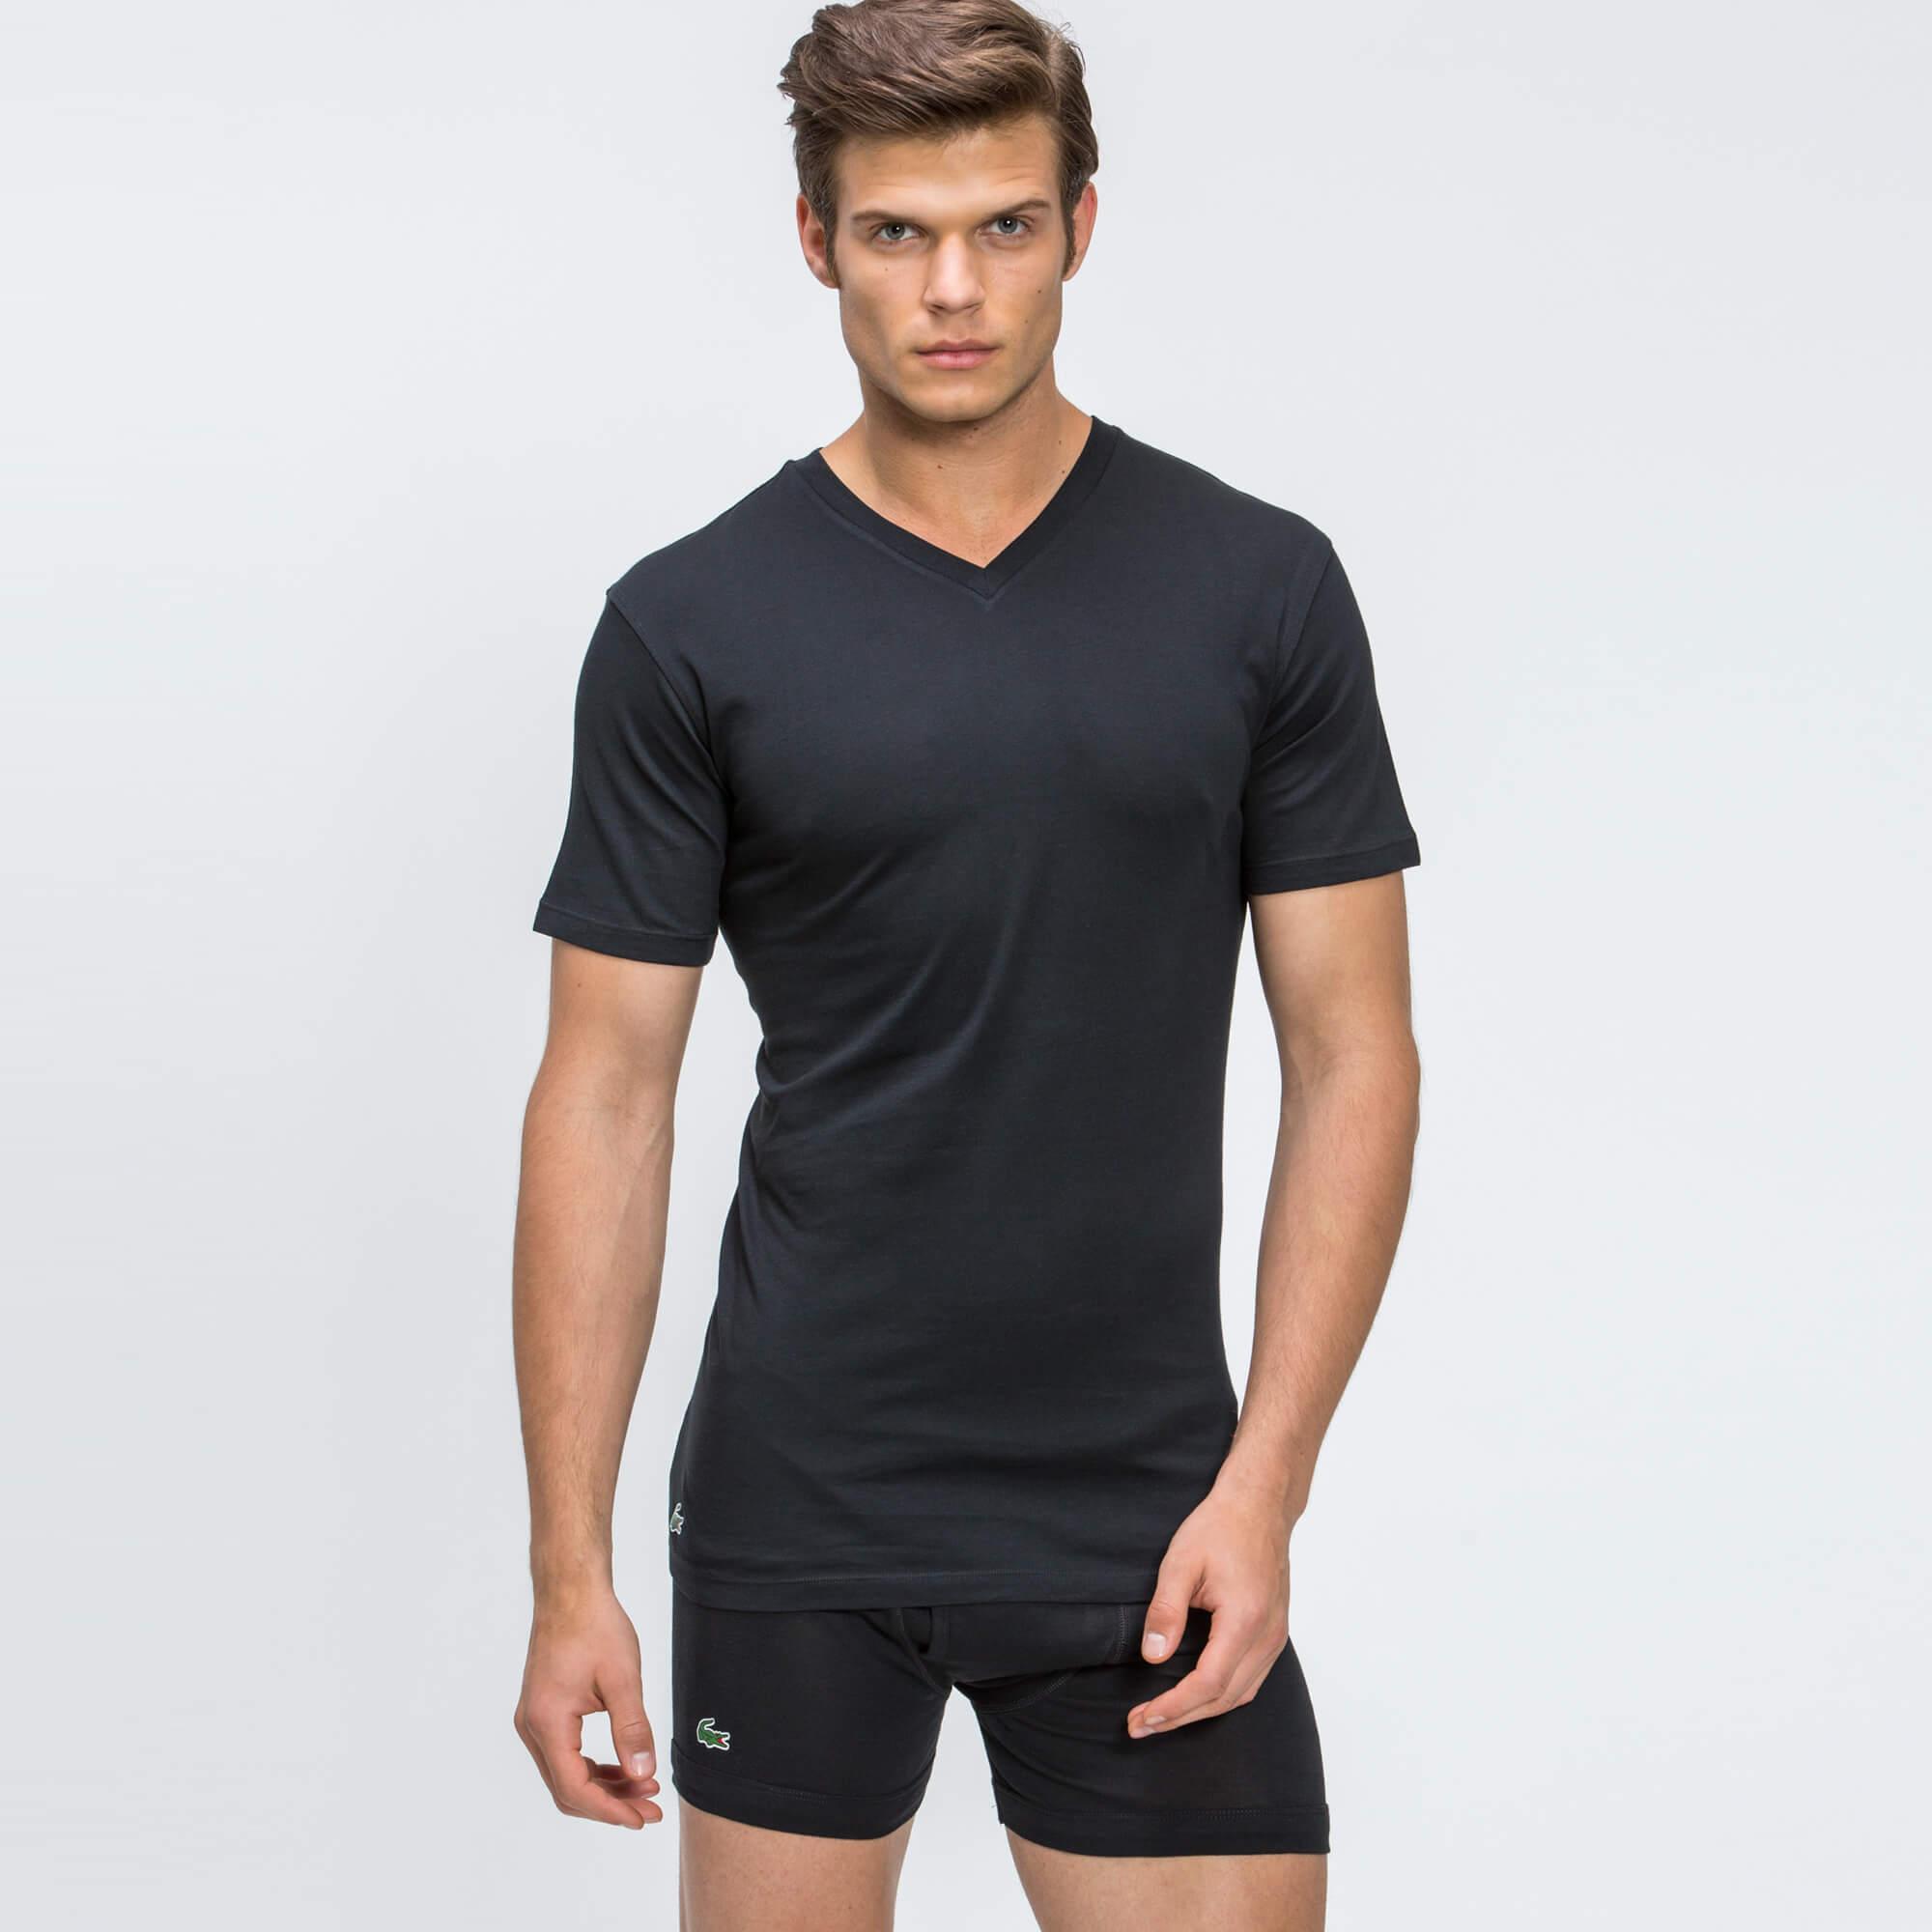 Lacoste Erkek 3'lü Siyah İç Giyim Tshirt